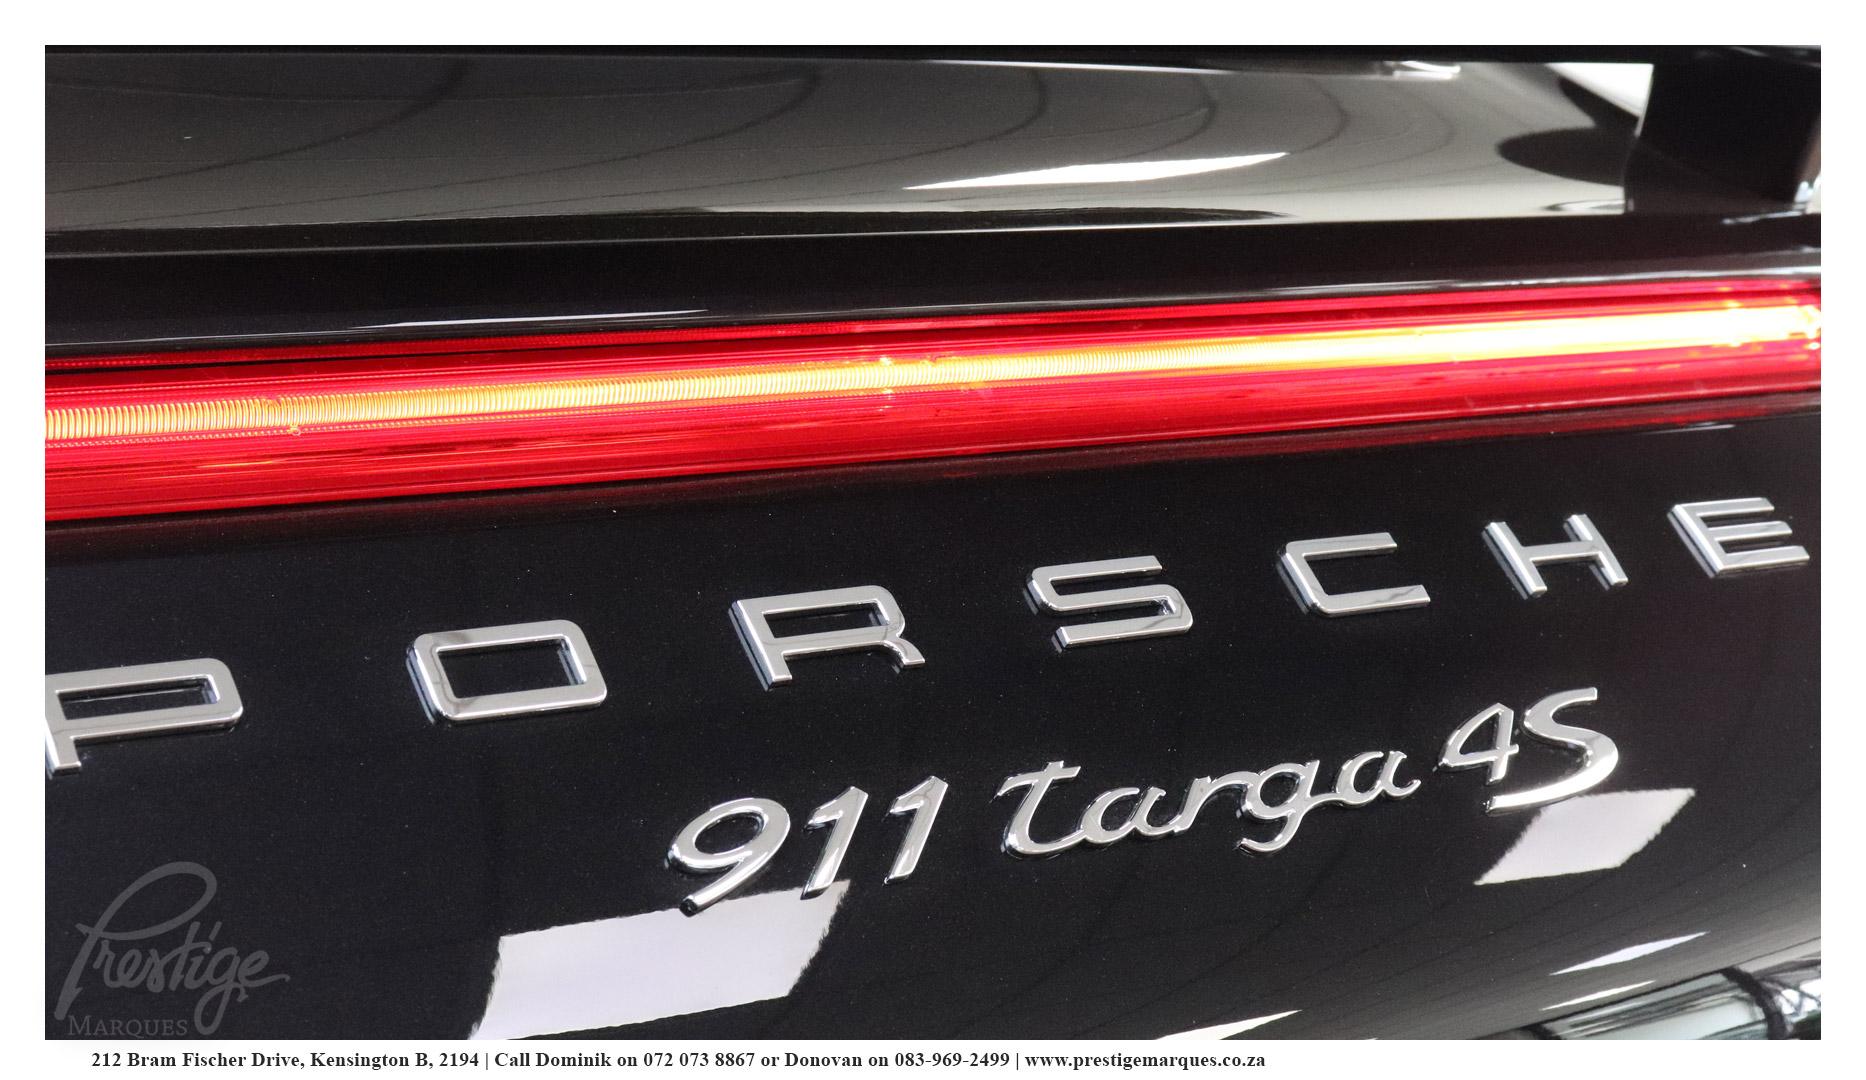 2015-Porsche-911-991-Targa-4s-PDK-Prestige-Marques-Randburg-Sandton-9